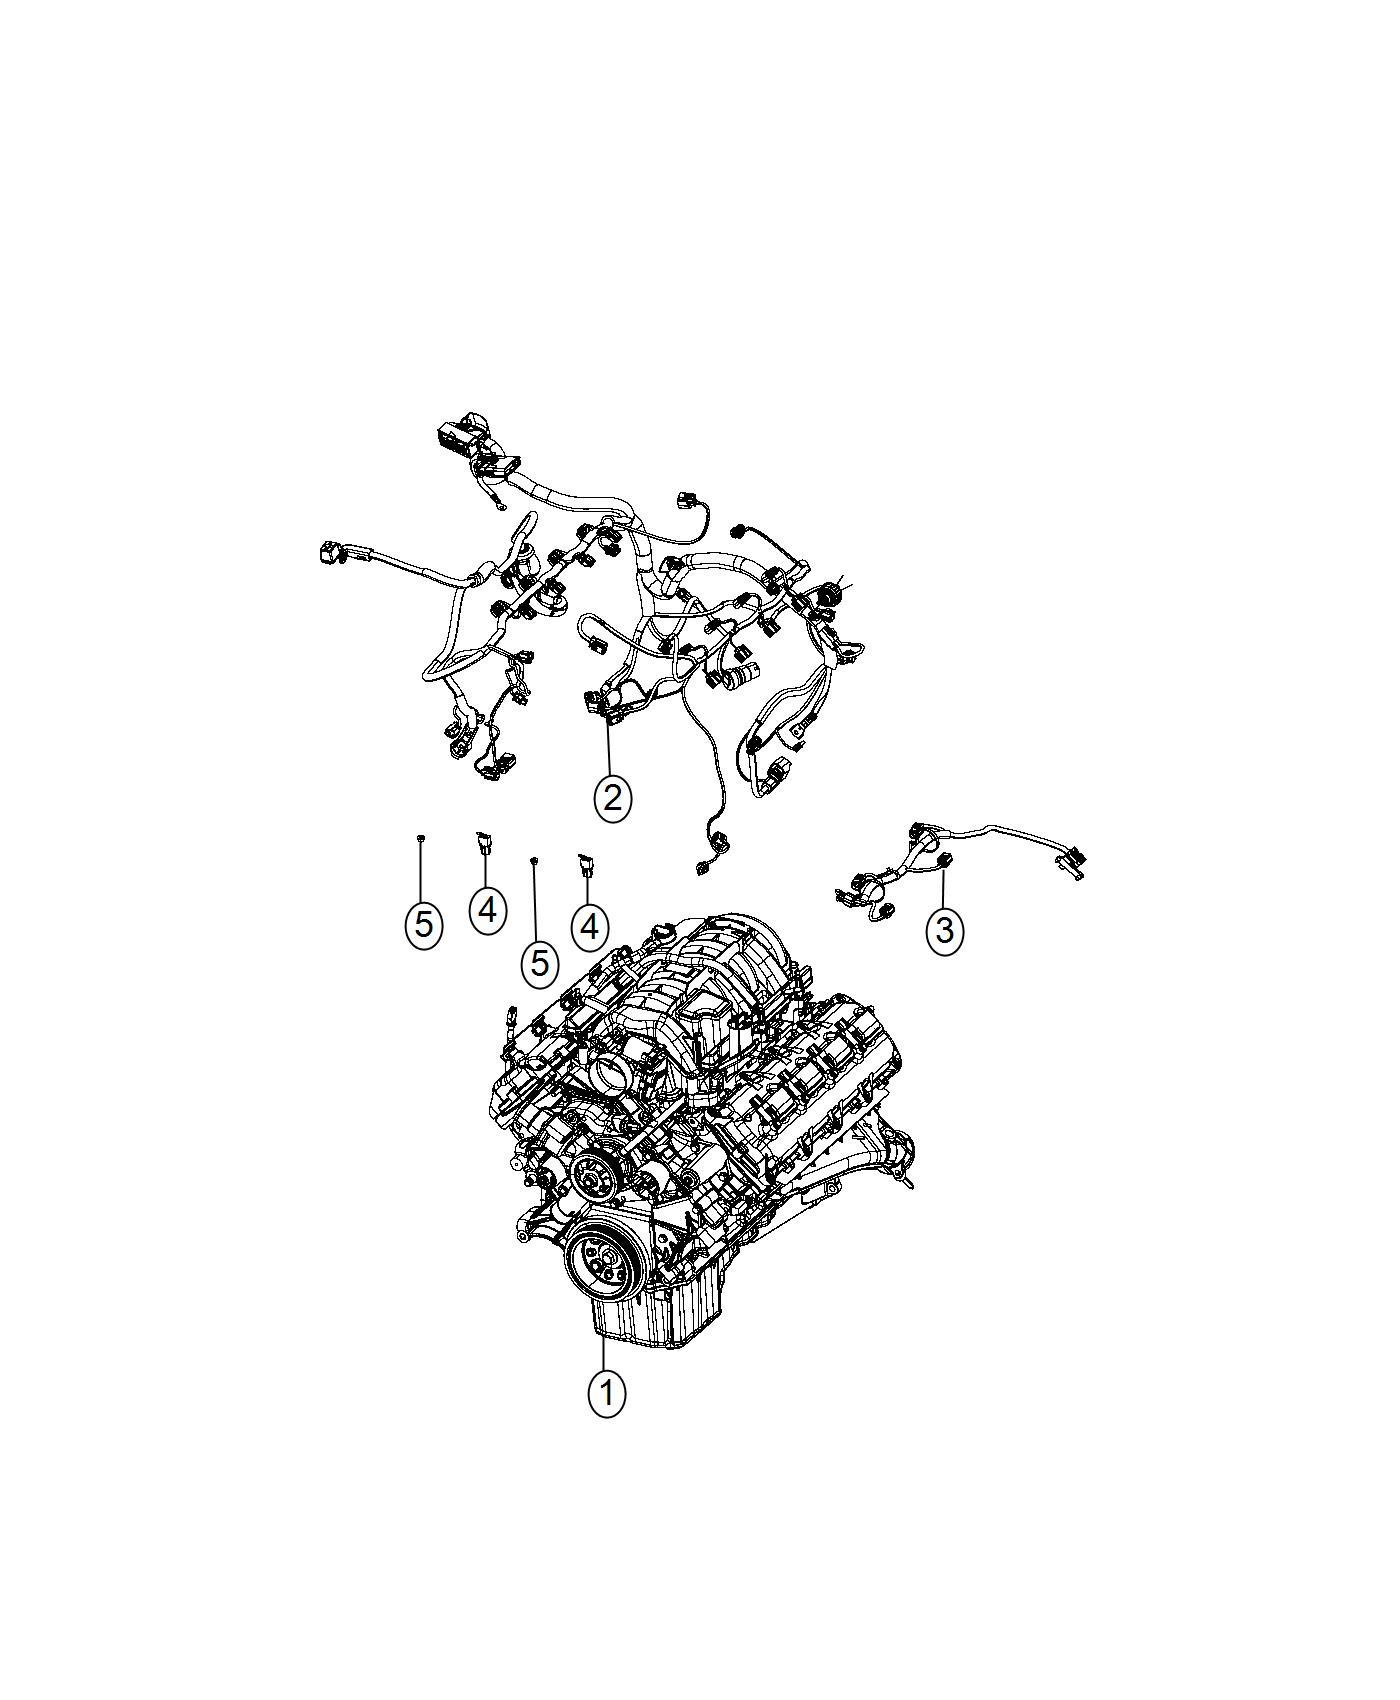 Dodge Charger Wiring Engine Powertrain Oil Mopar